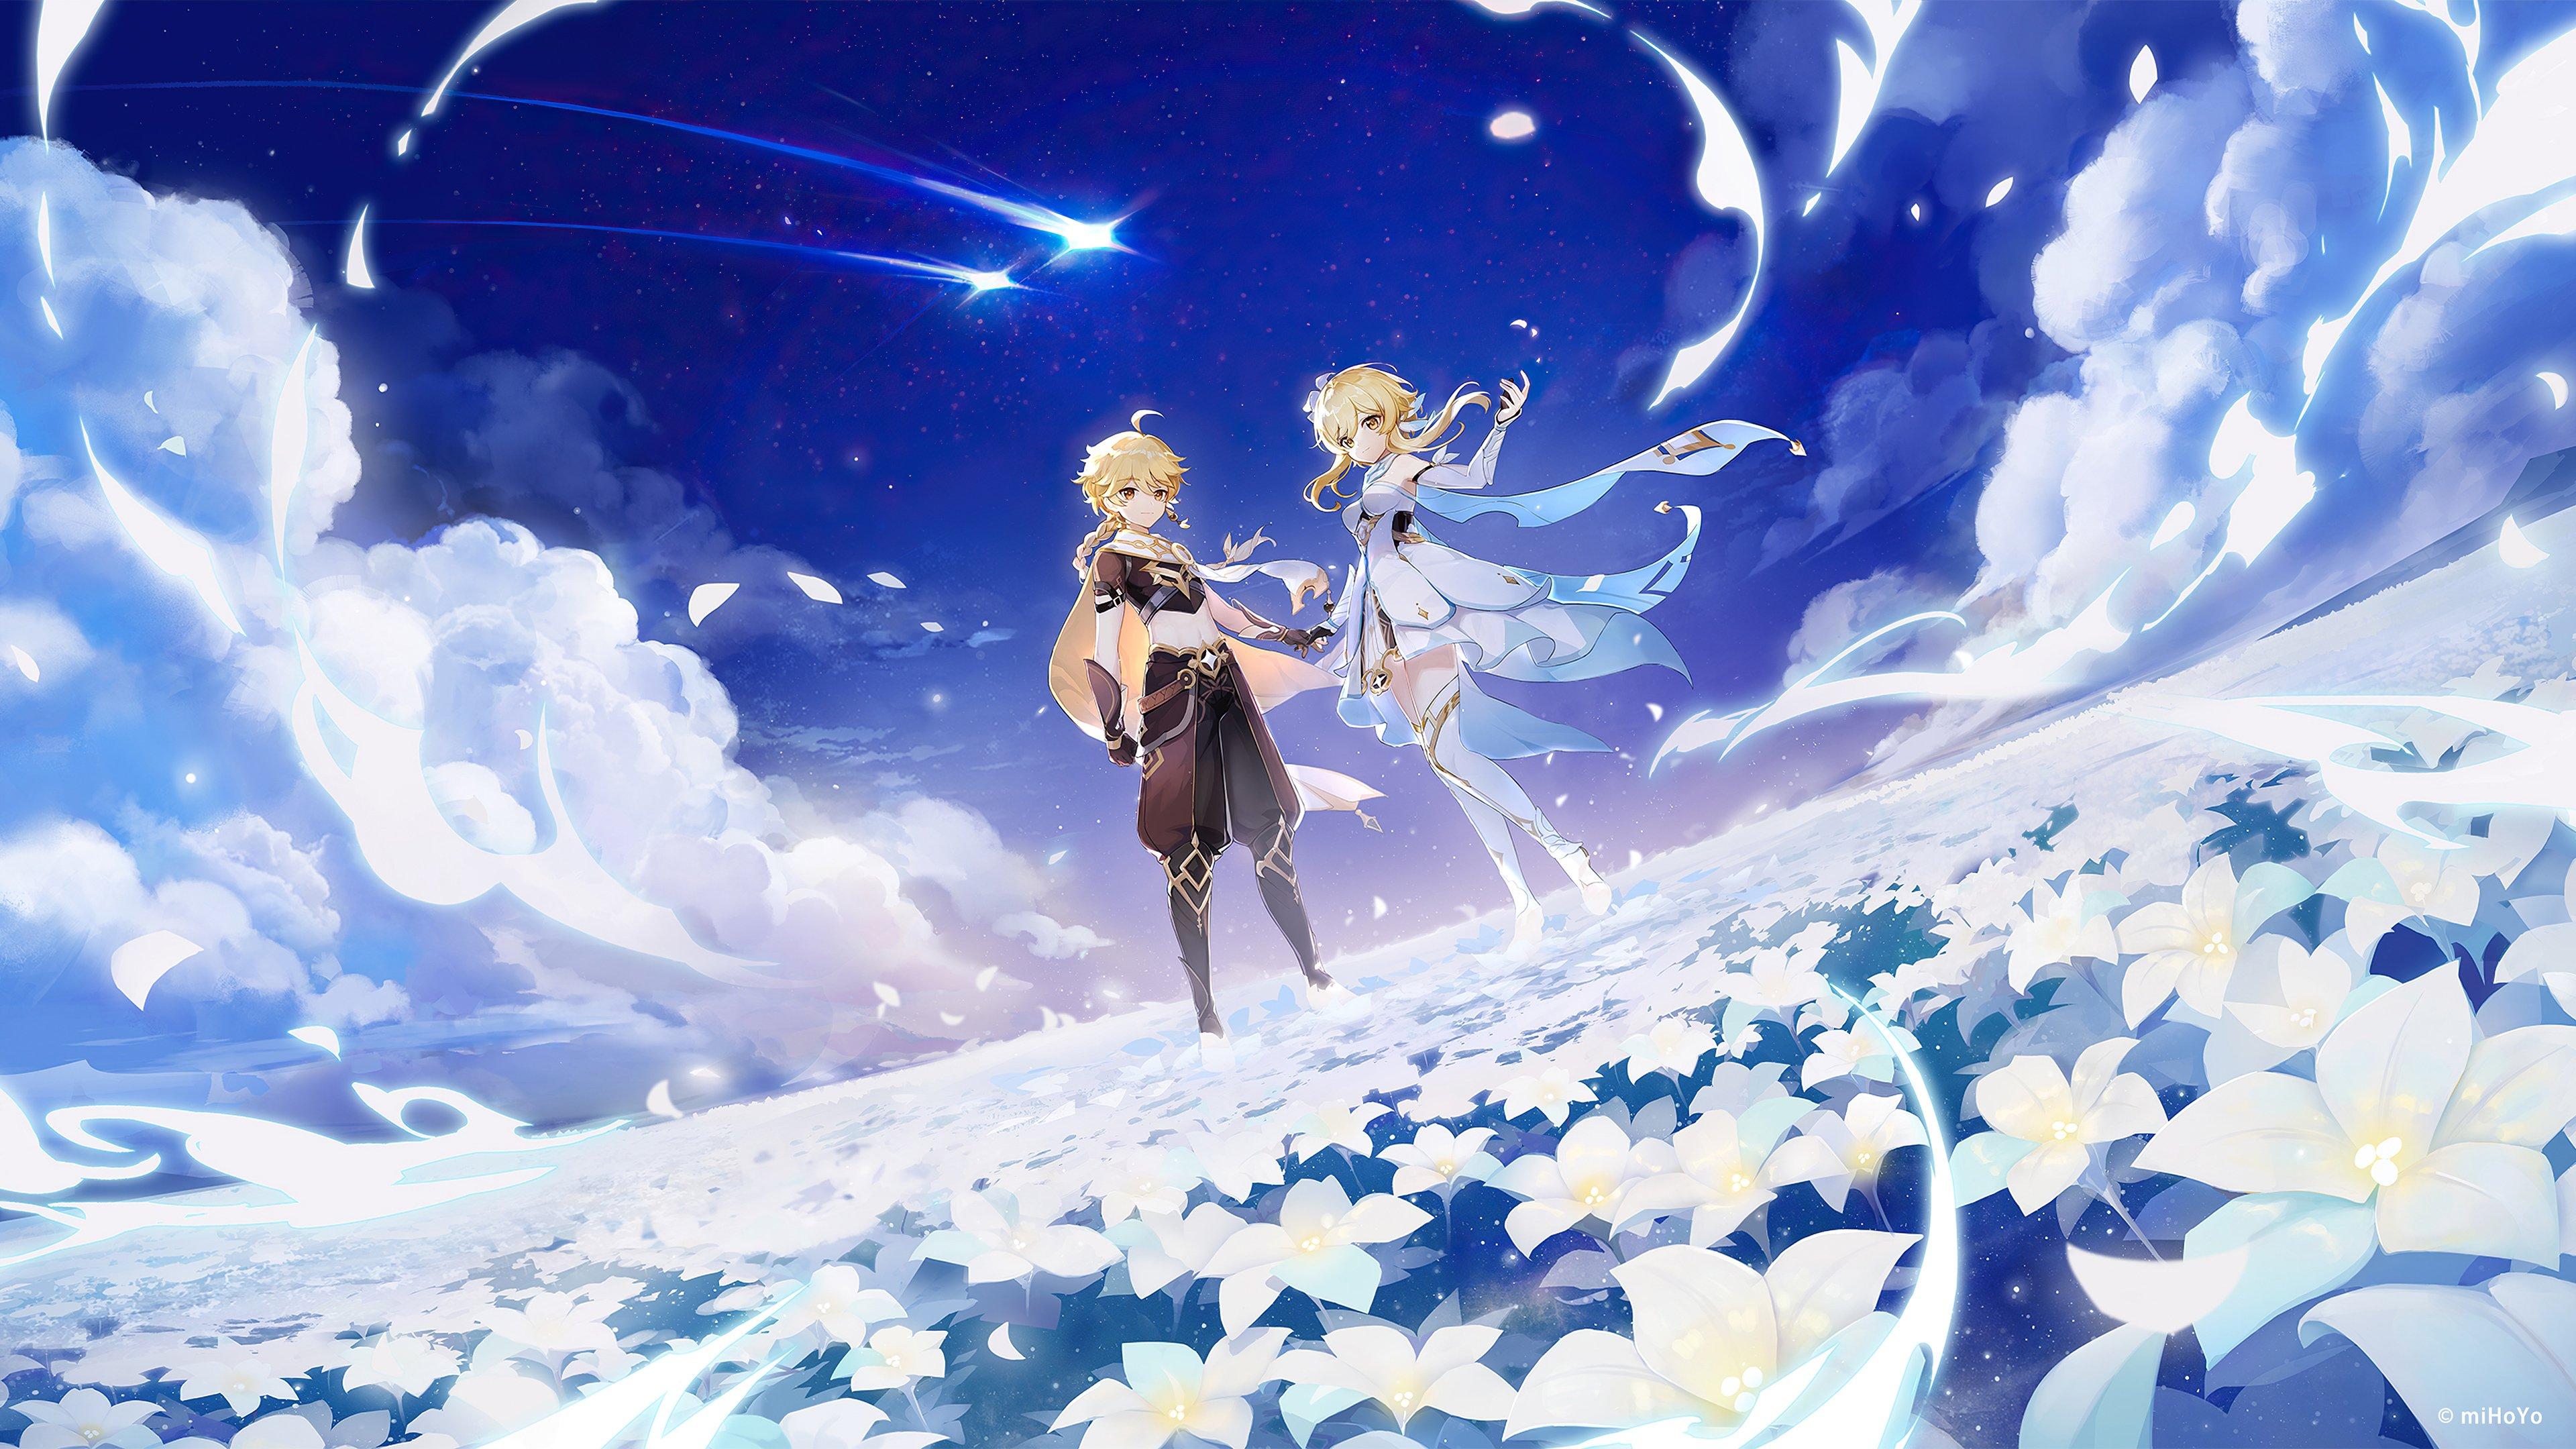 Fondos de pantalla Viajero Aether y Lumine from Genshin Impact